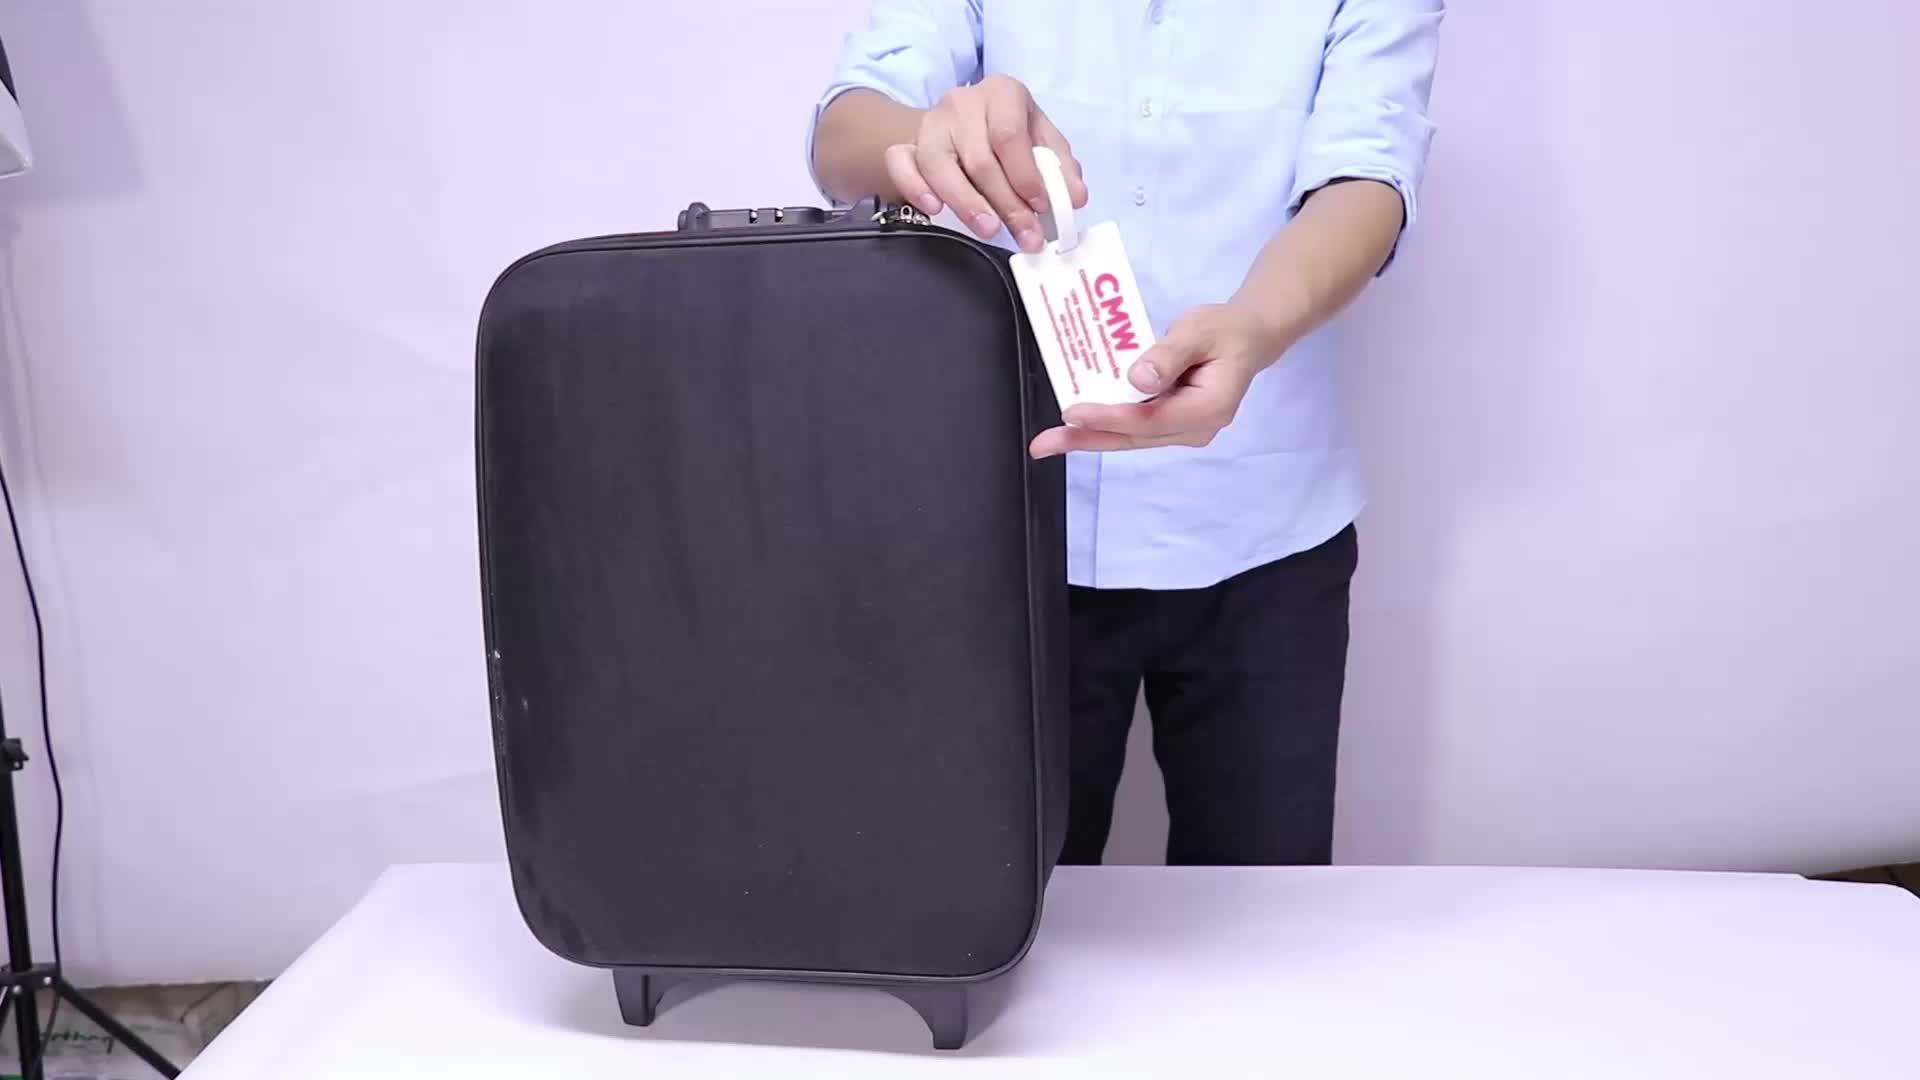 Oempromo custom soft pvc luggage tag